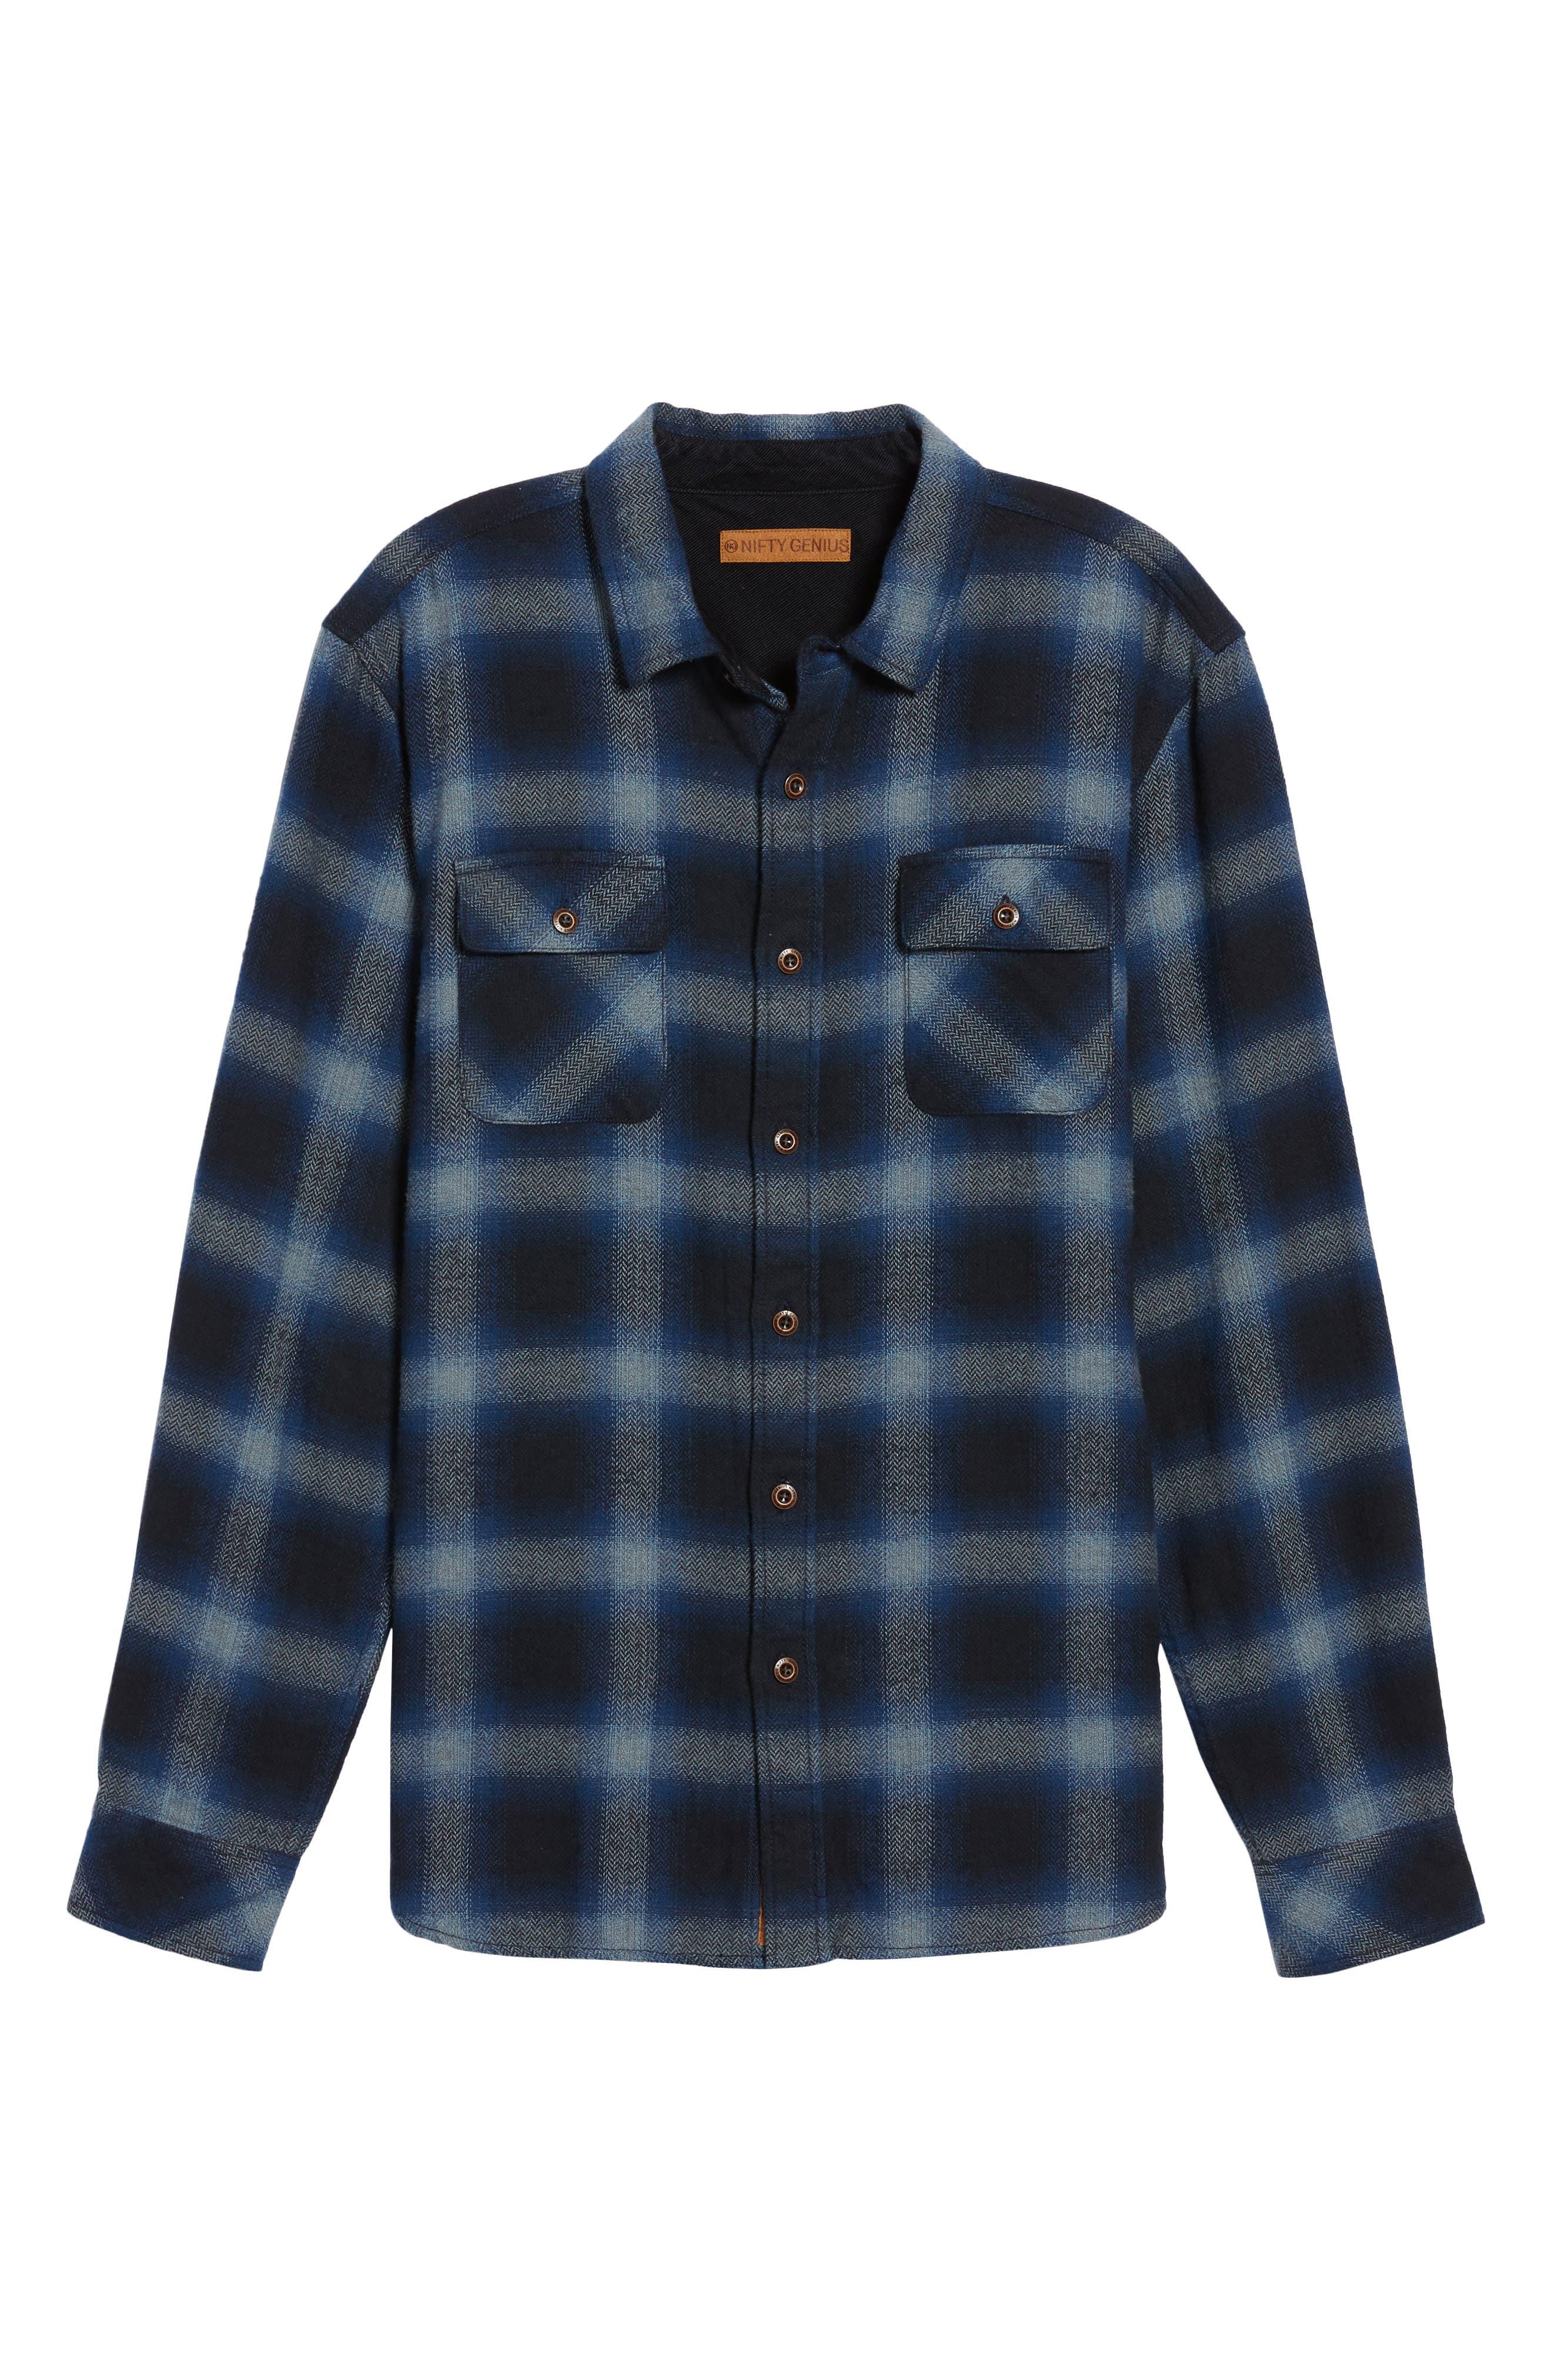 Truman Outdoor Check Sport Shirt,                             Alternate thumbnail 6, color,                             Navy/ Blue